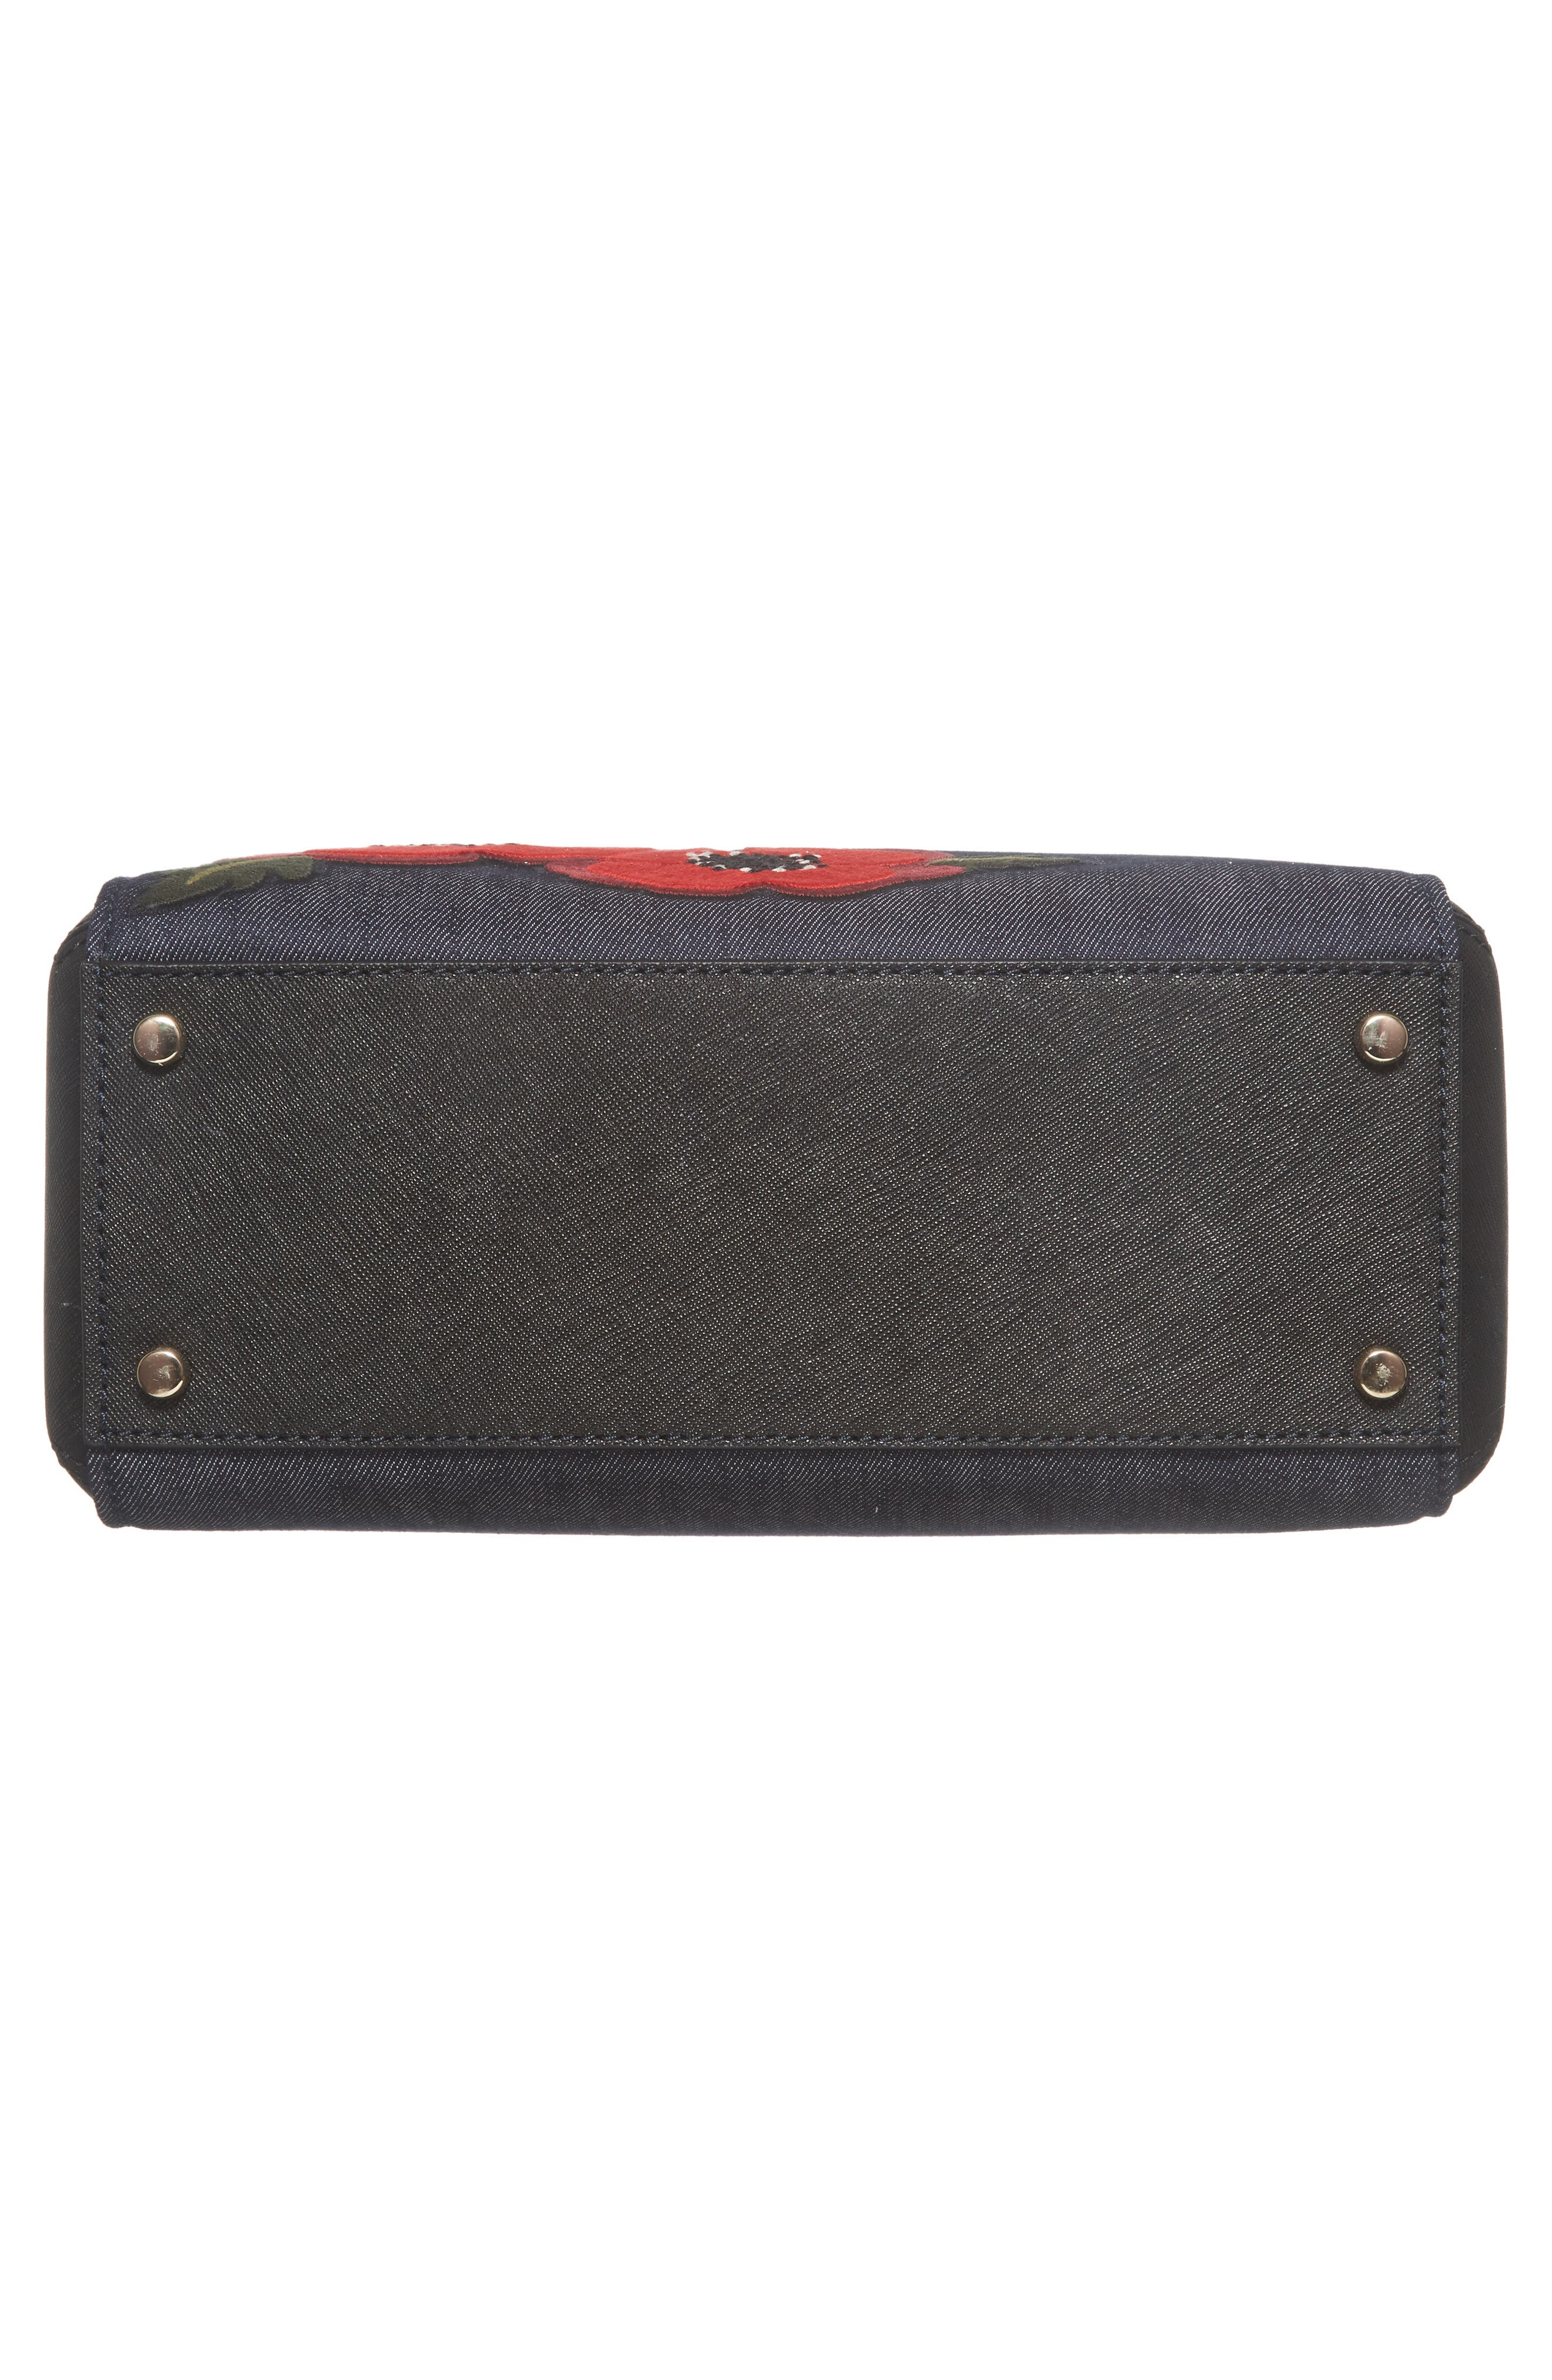 cameron street poppy large lane embroidered denim satchel,                             Alternate thumbnail 4, color,                             Port Blue